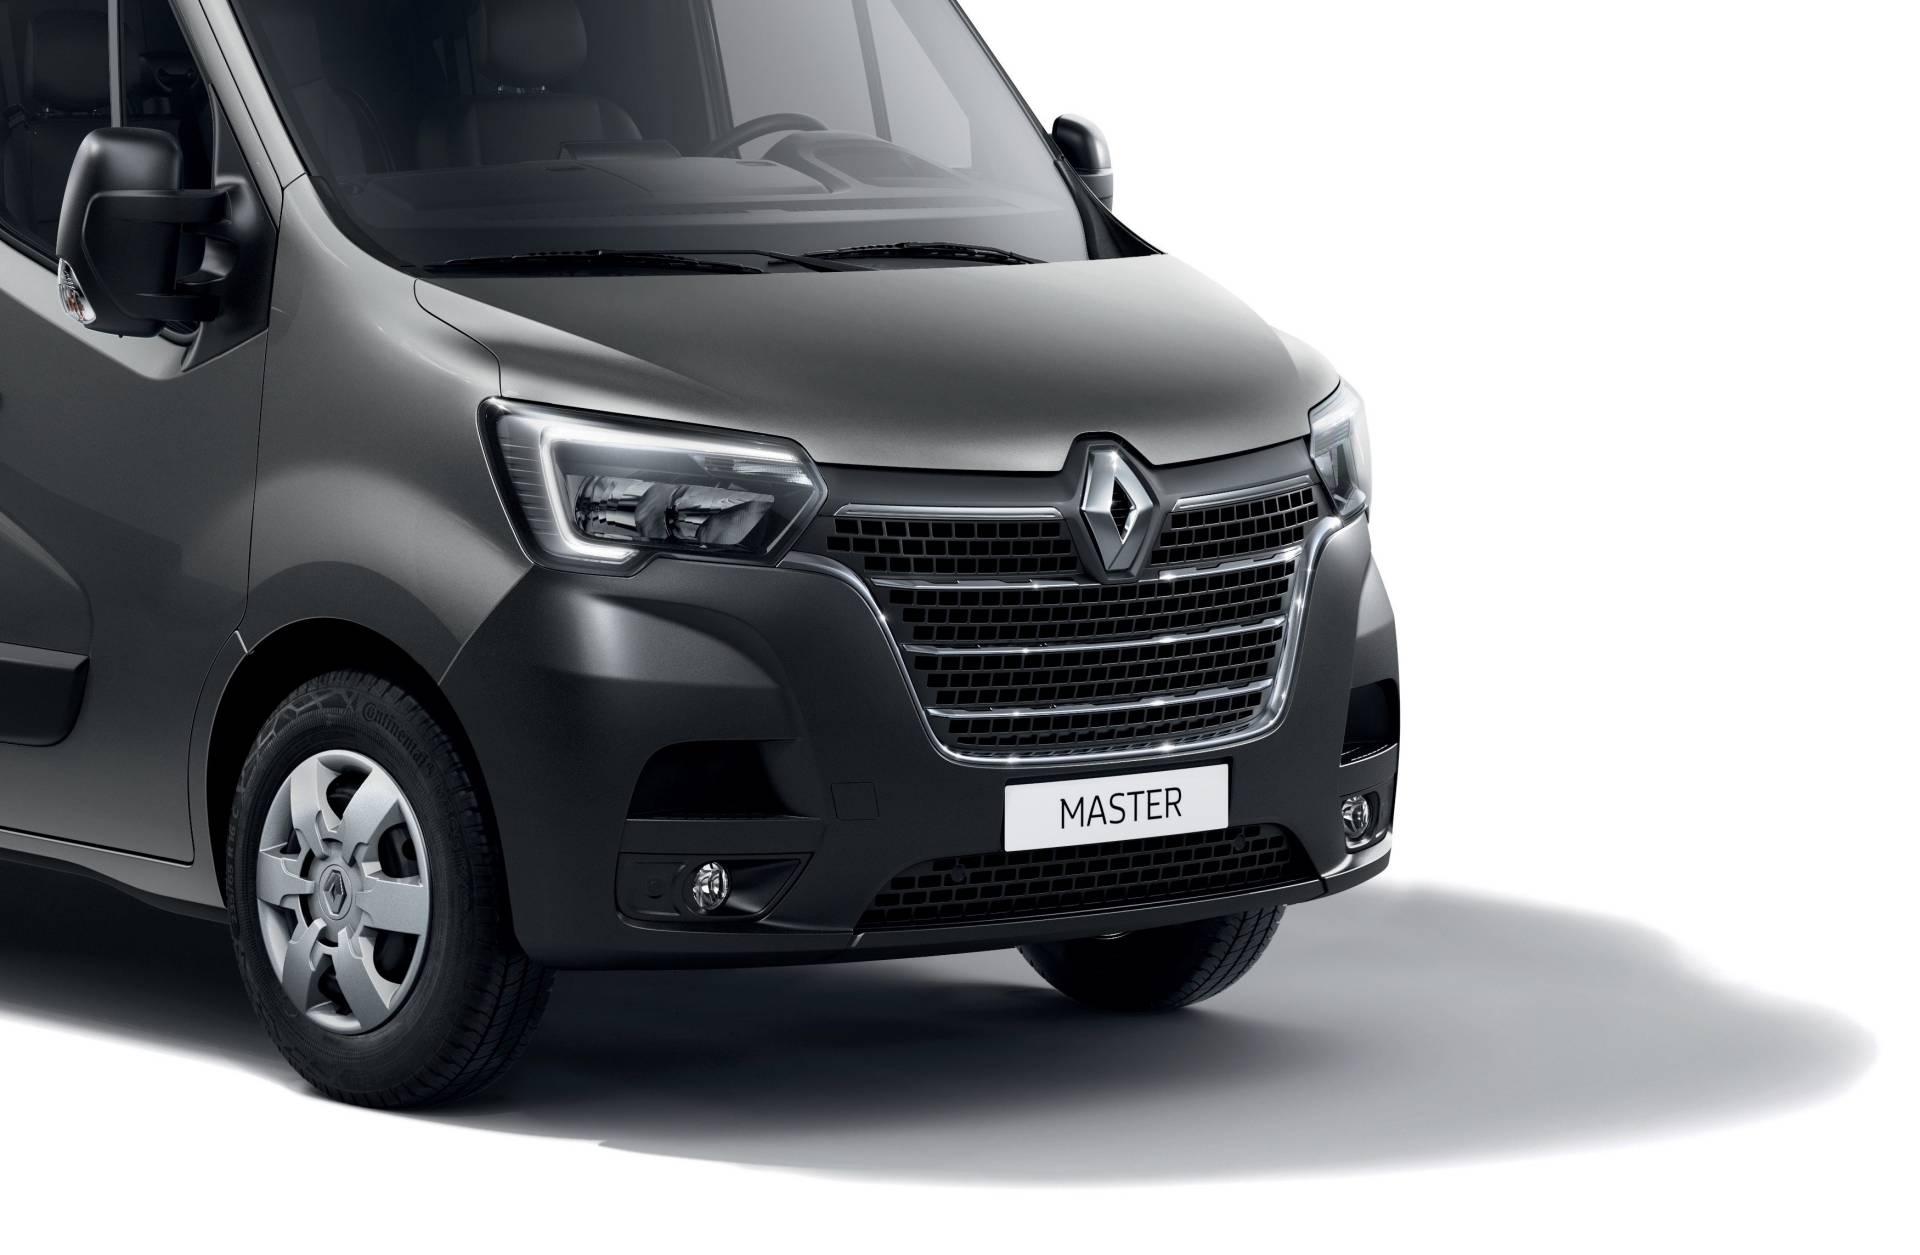 8820cc3b-2019my-renault-master-van-facelift-21